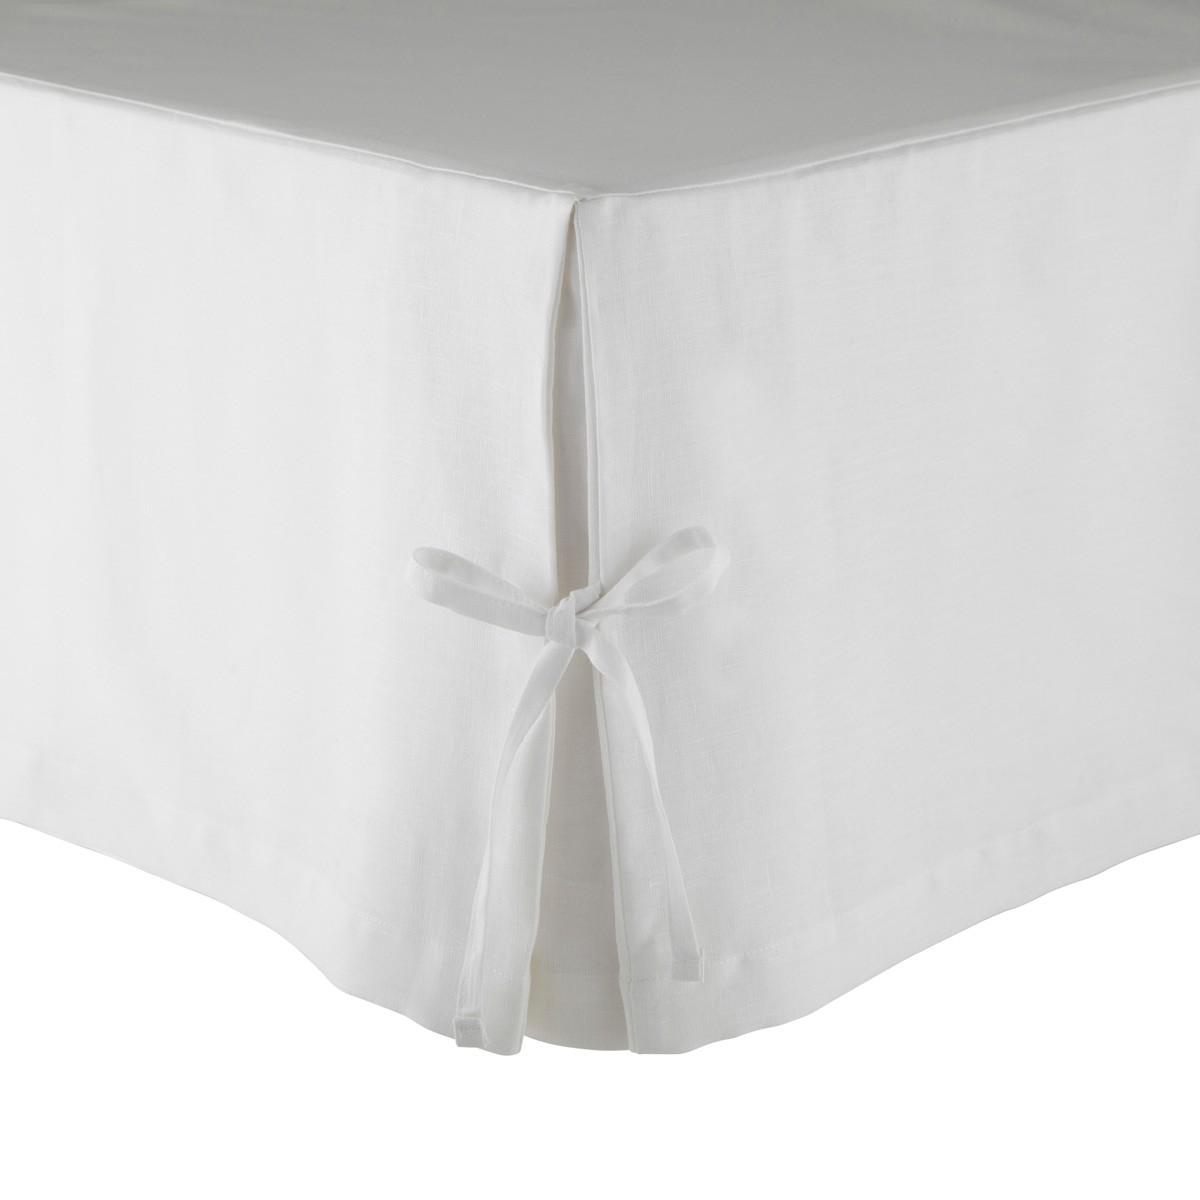 Cache sommier Lin Blanc 90 x 190 cm (photo)